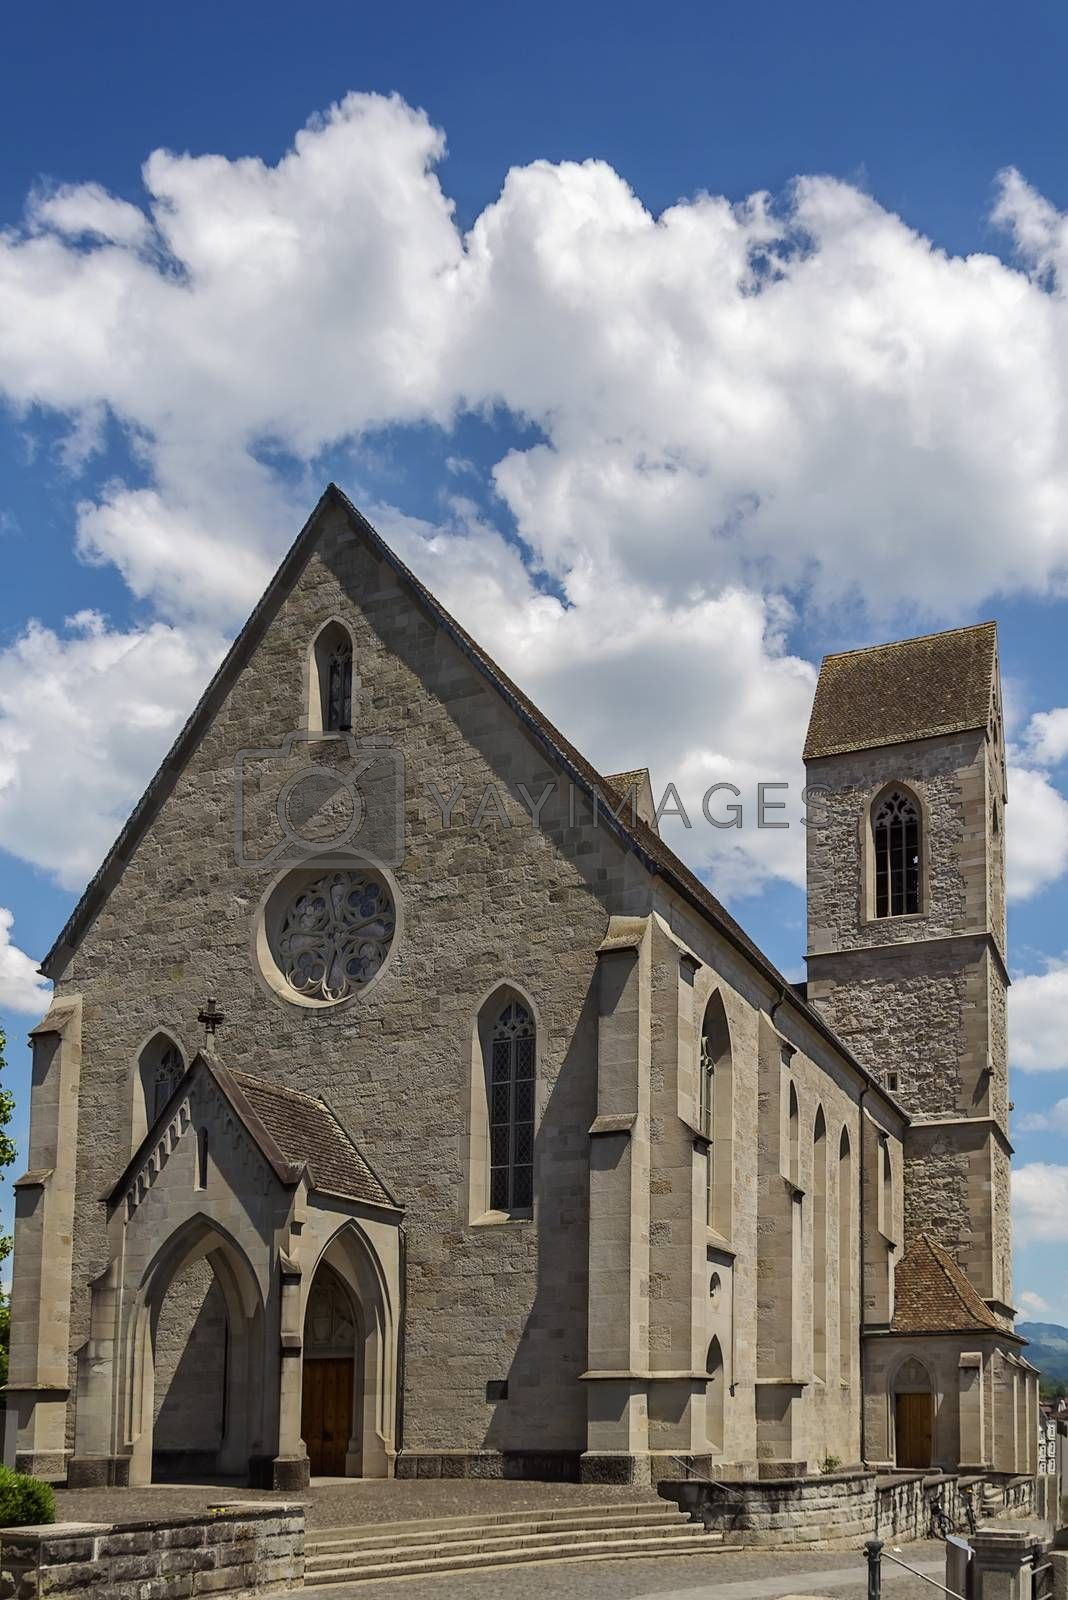 St. John's Church, Rapperswil by borisb17